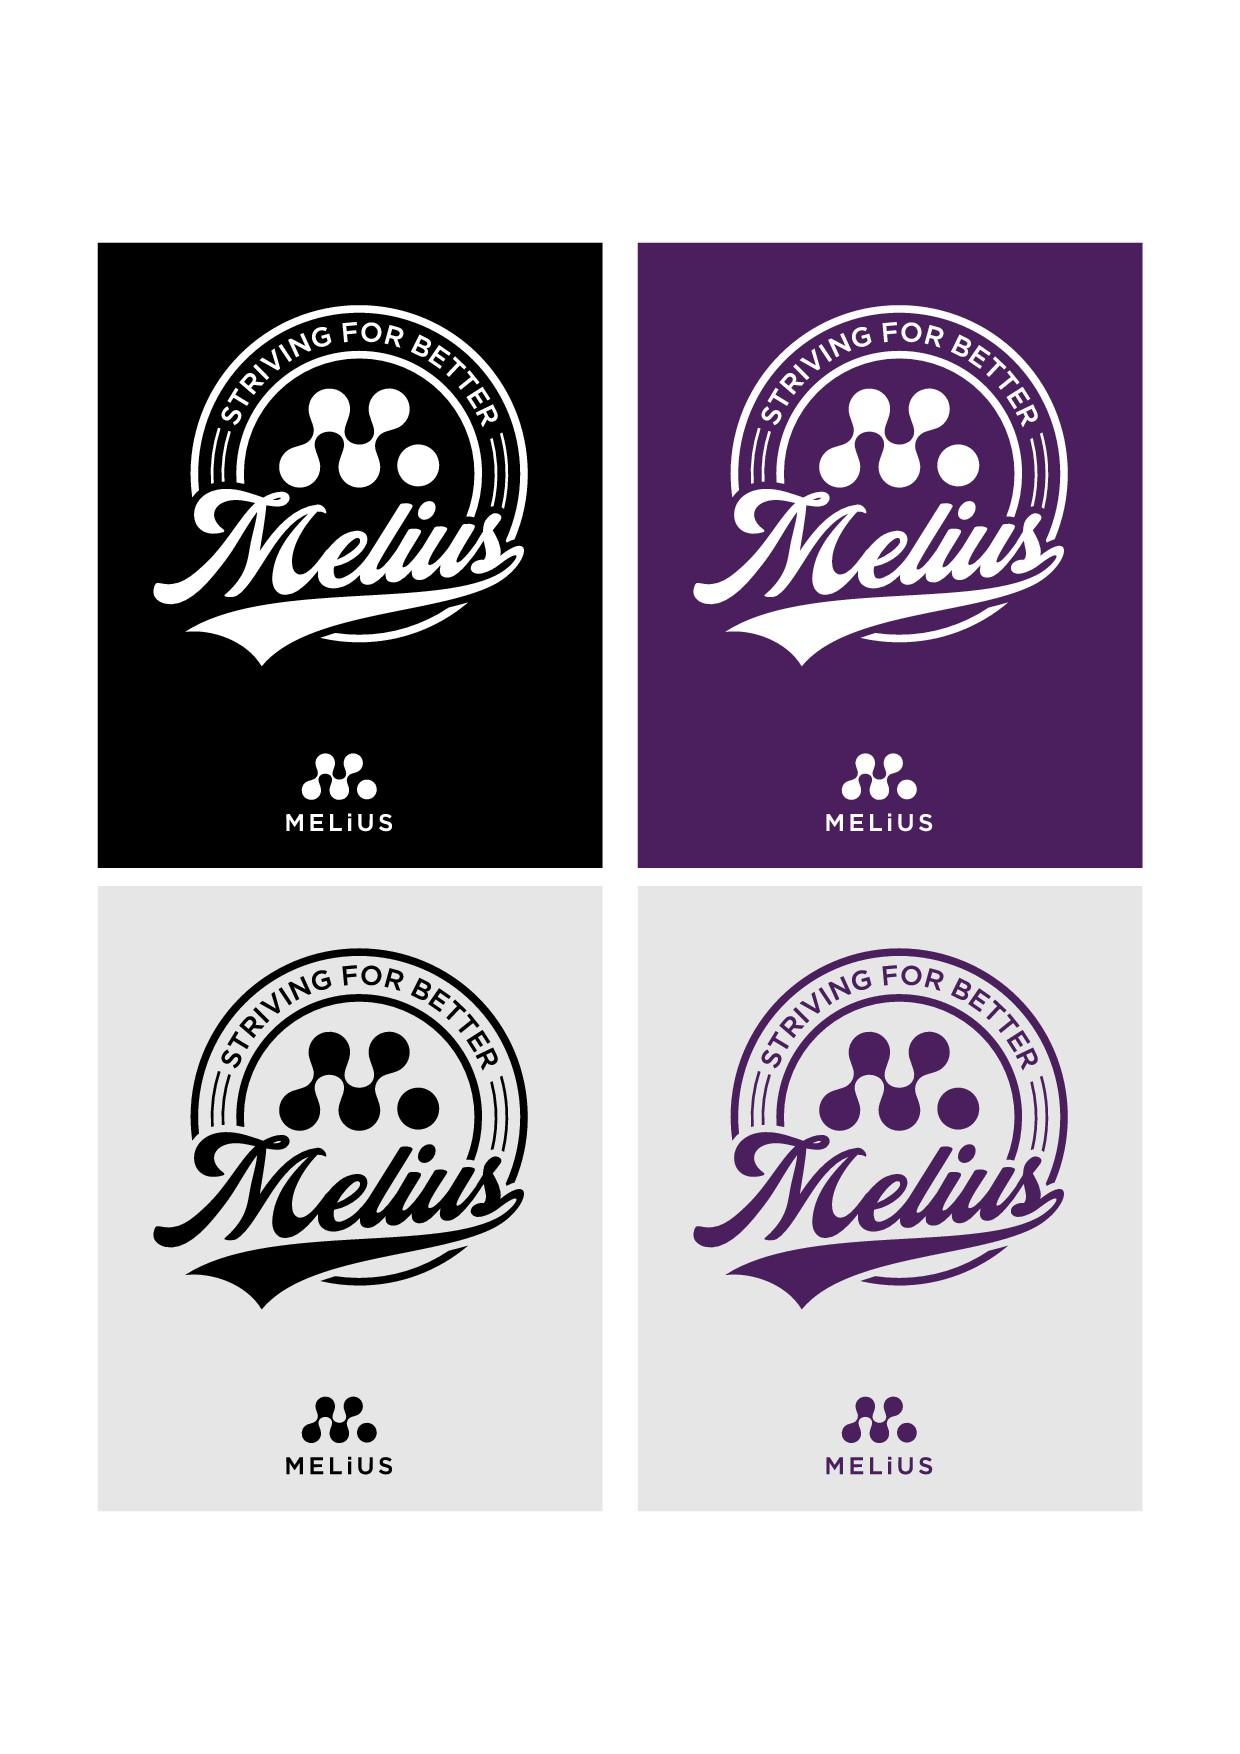 Design company merchandise (cap)